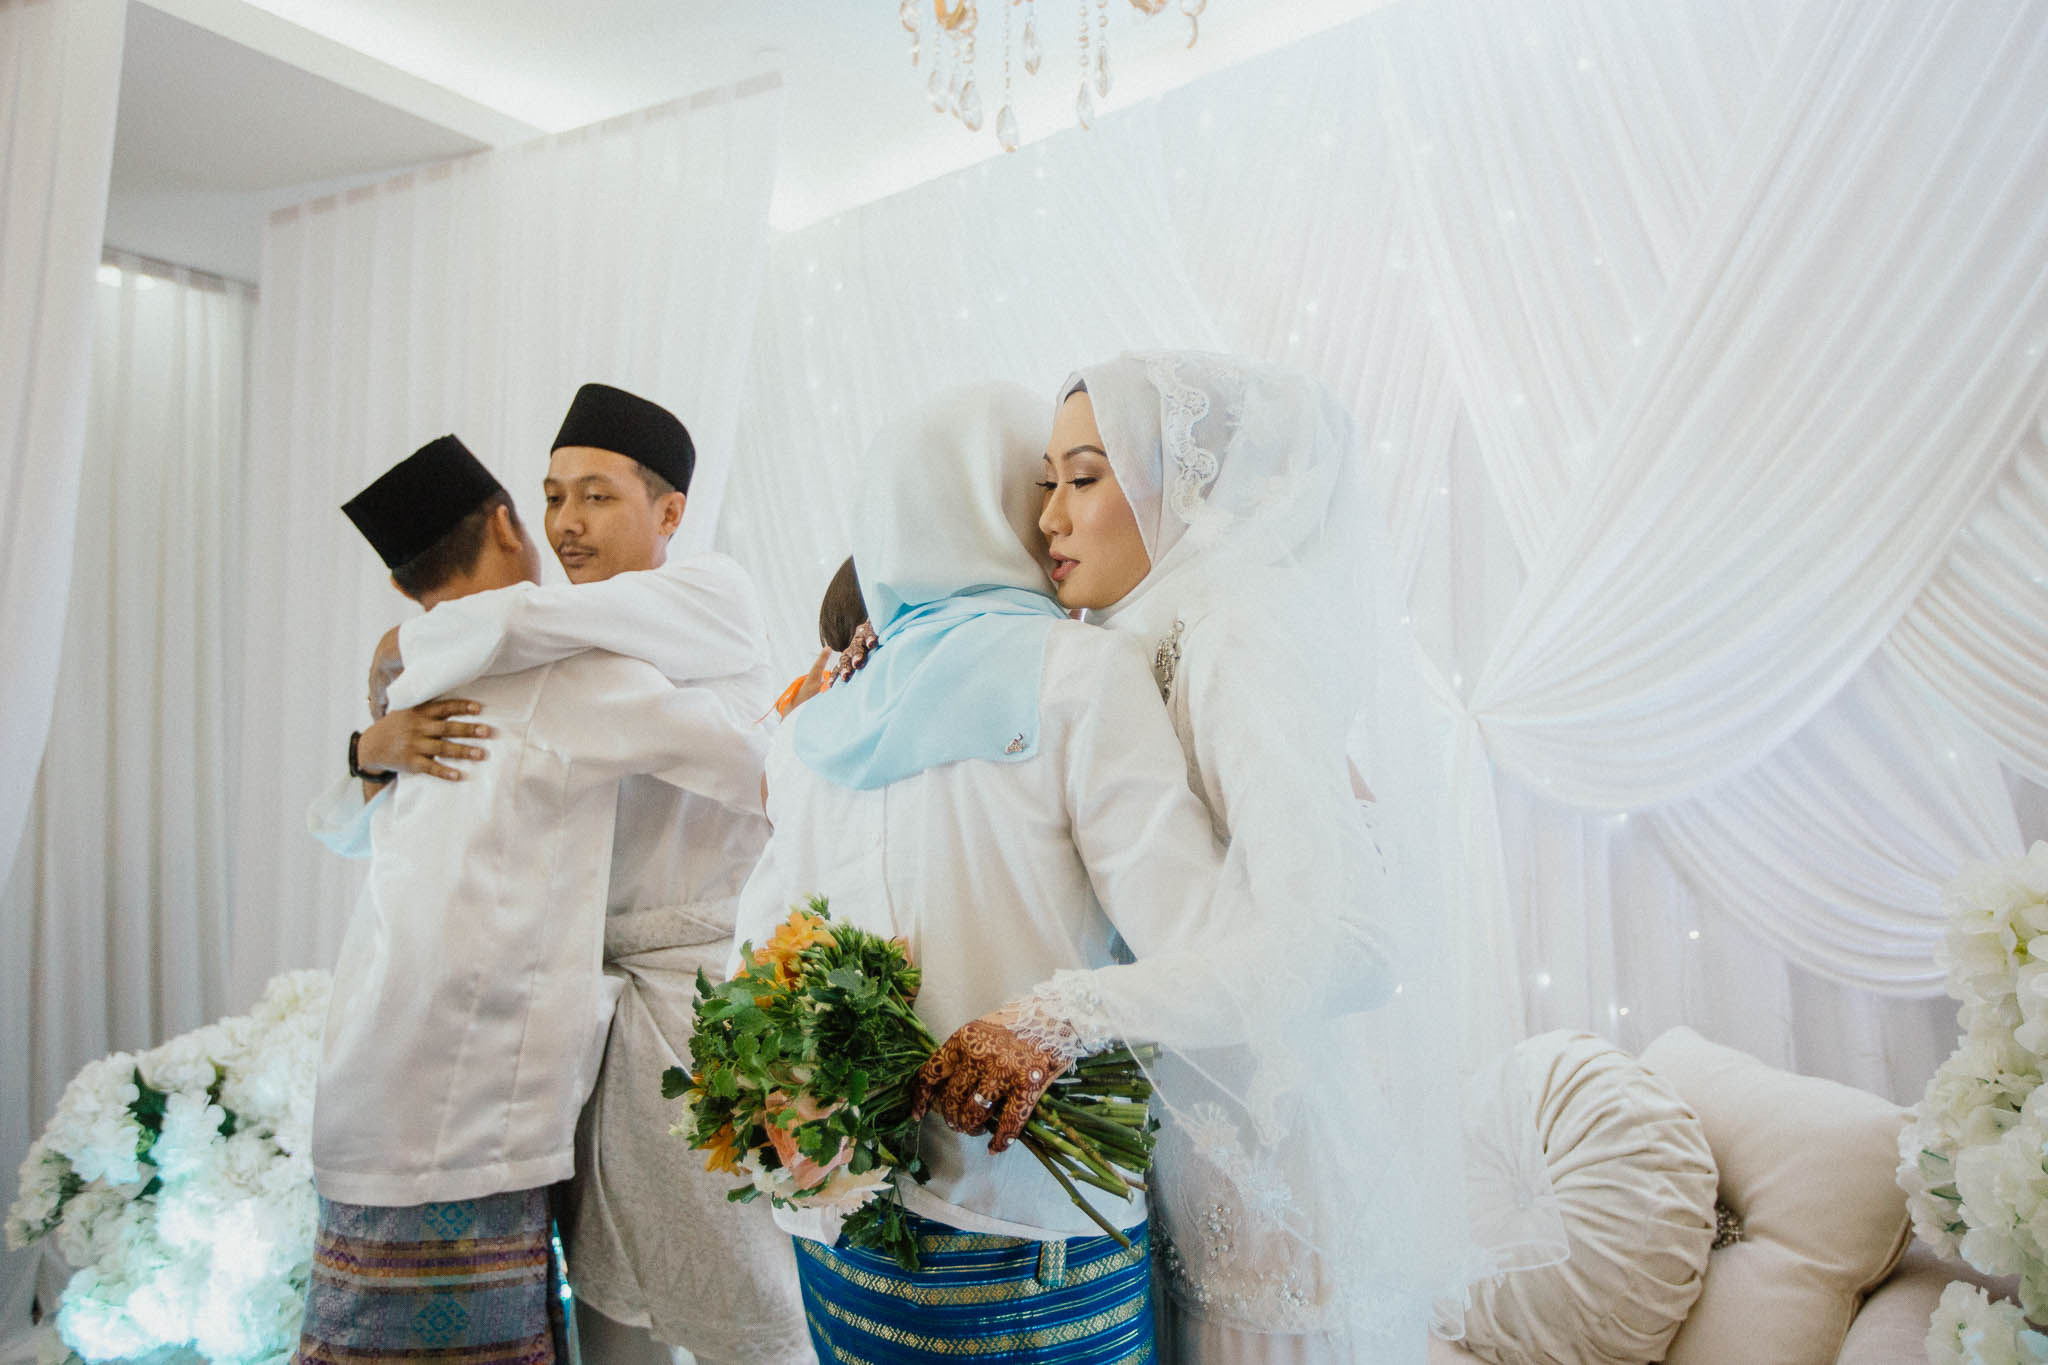 singapore-wedding-photographer-wedding-nufail-addafiq-029.jpg